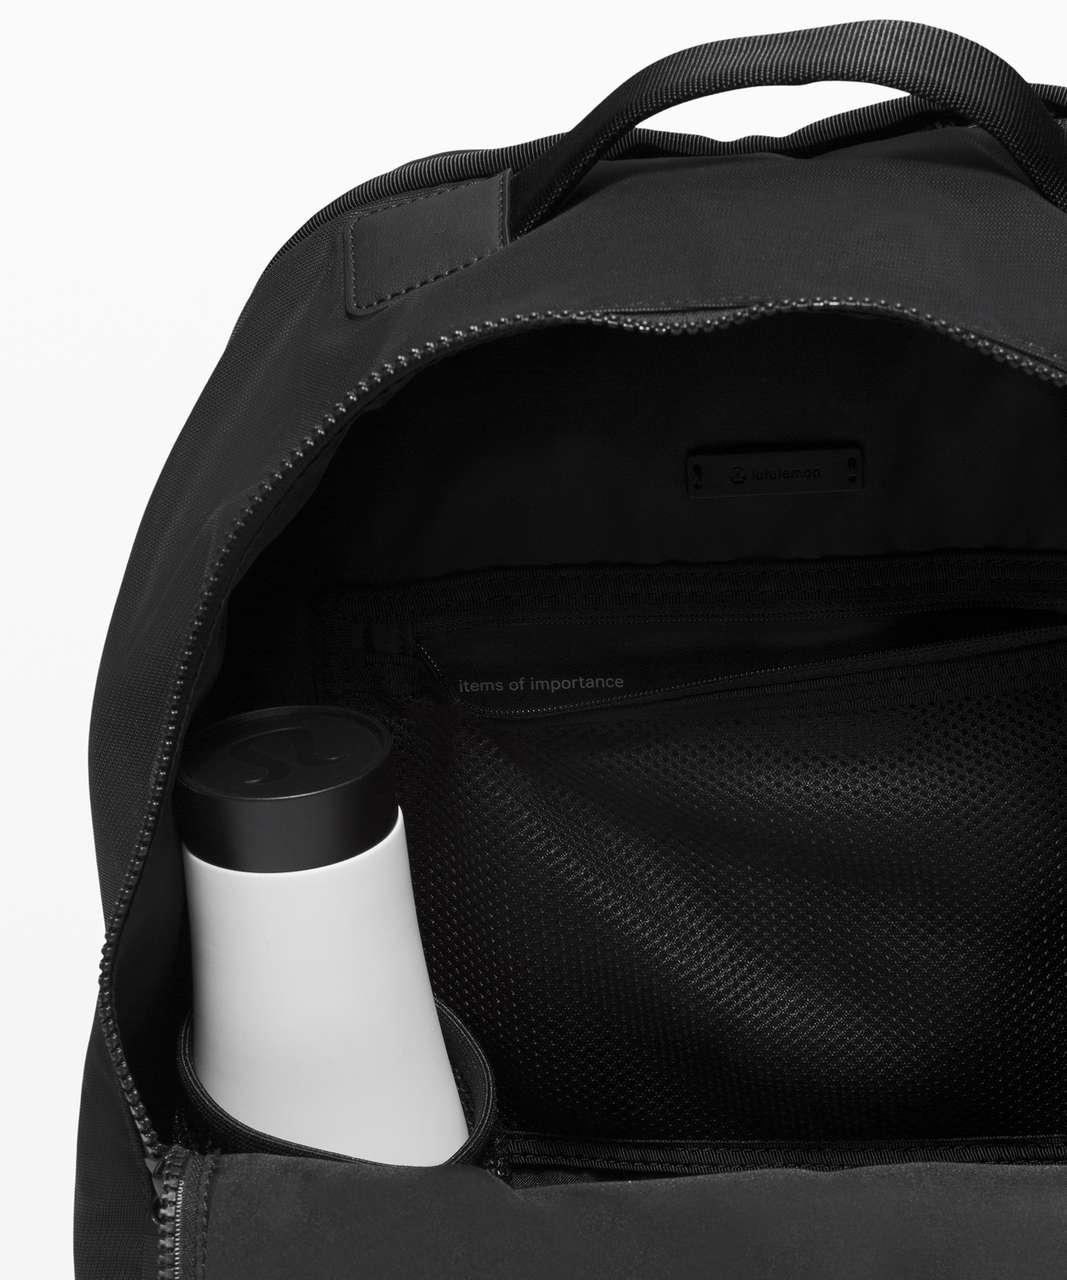 Lululemon City Adventurer Backpack Reflective *17L - Silver Reflective / Black